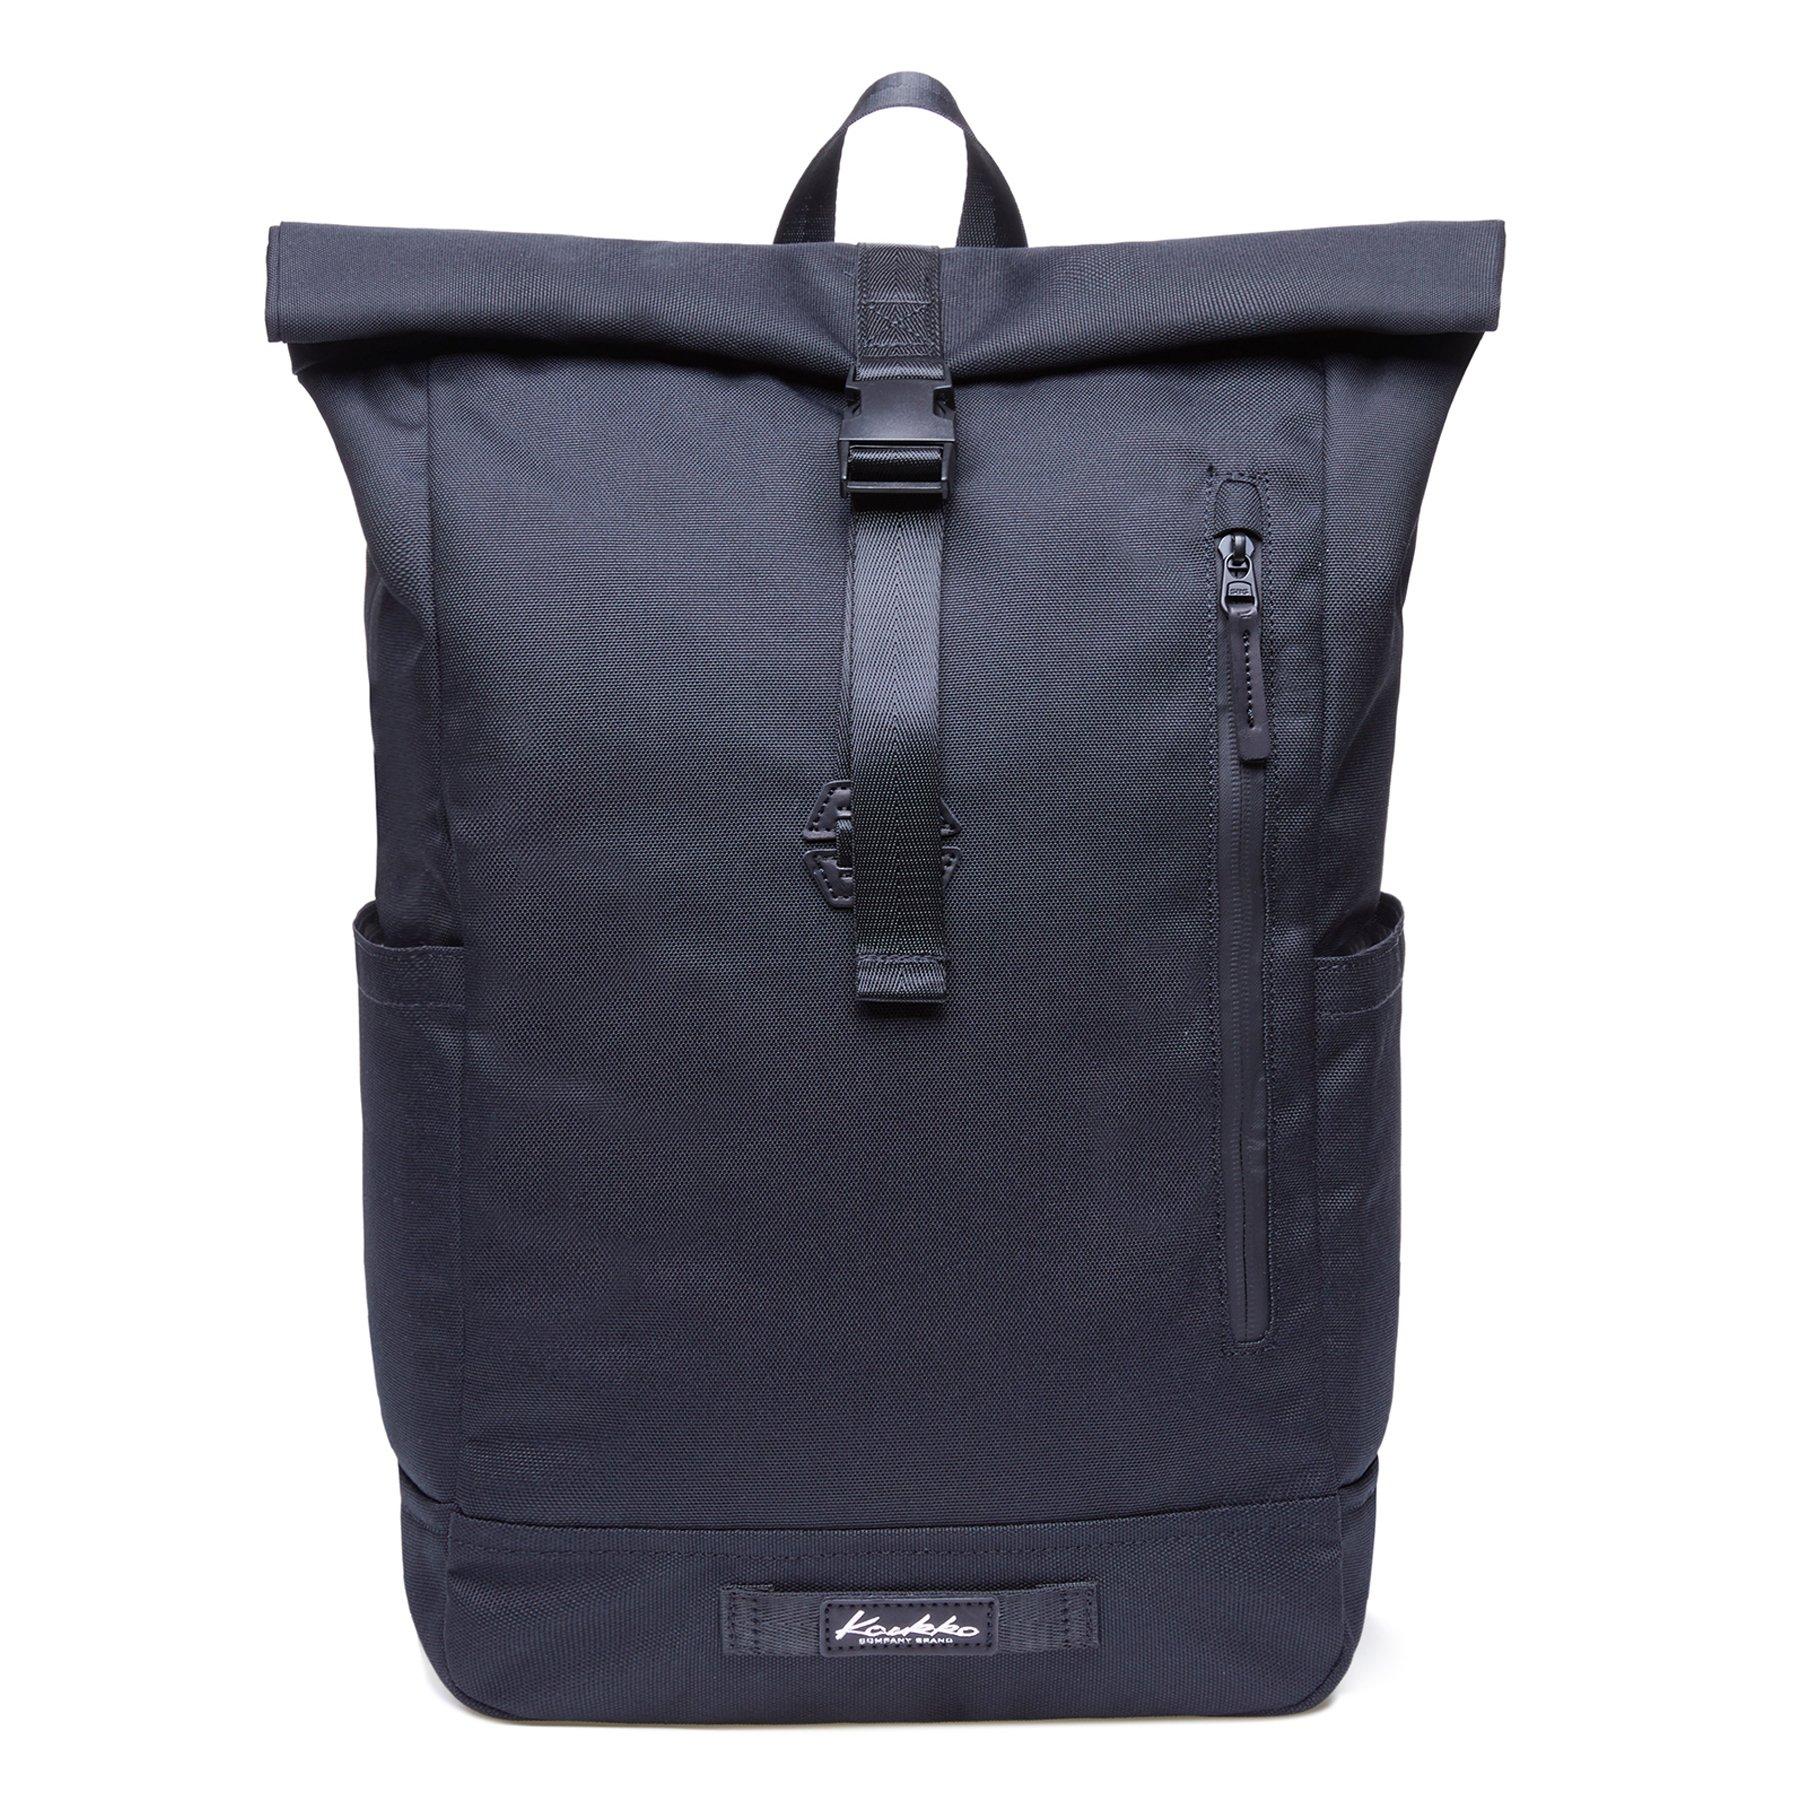 KAUKKO Casual Daypacksμltipurpose backpacks,Outdoor Backpack,Travel Casual Rucksack,Laptop Backpack Fits 15'' (04black)